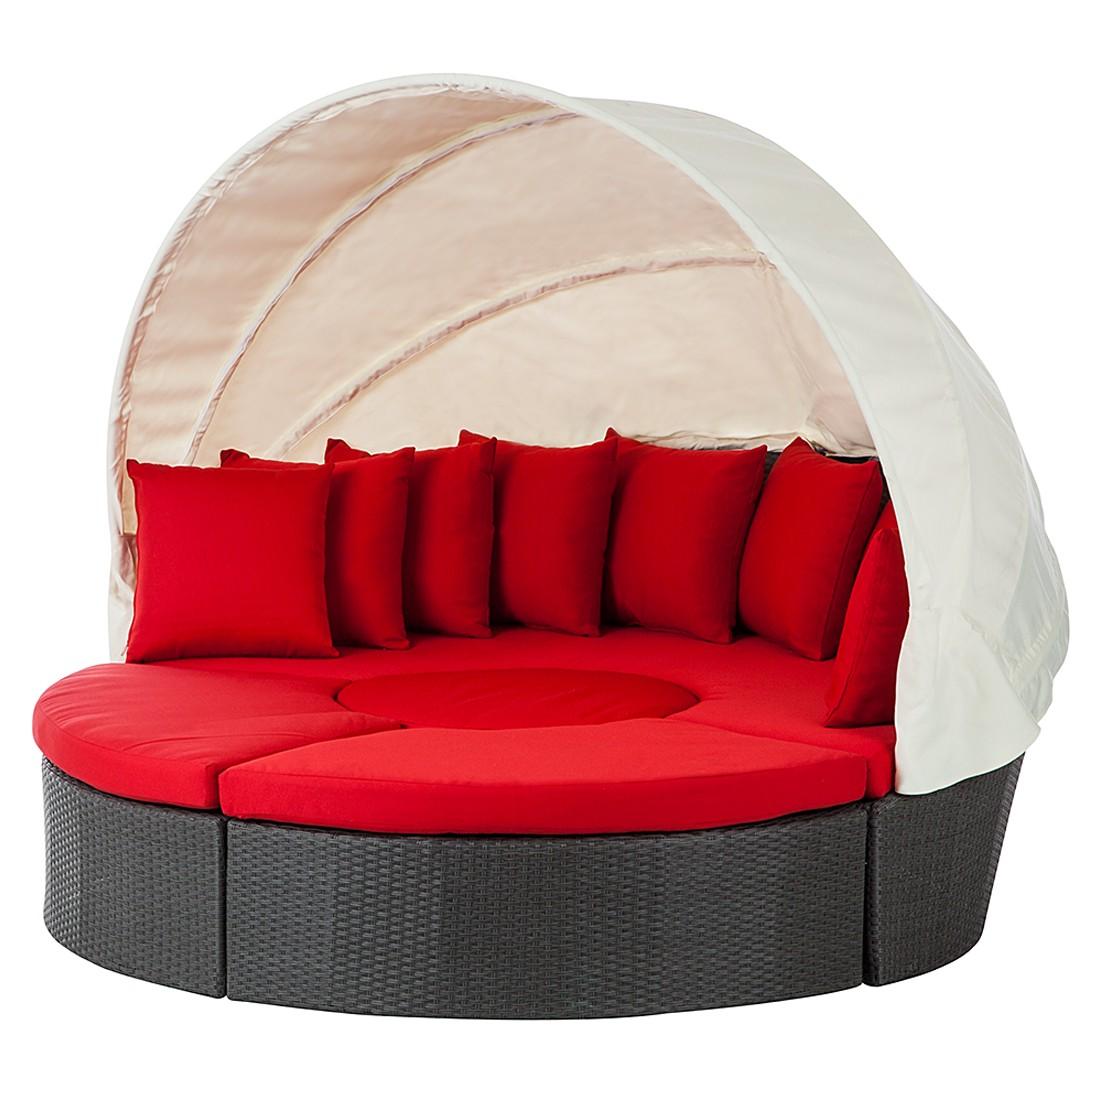 polyrattan sonneninsel g nstig kaufen. Black Bedroom Furniture Sets. Home Design Ideas